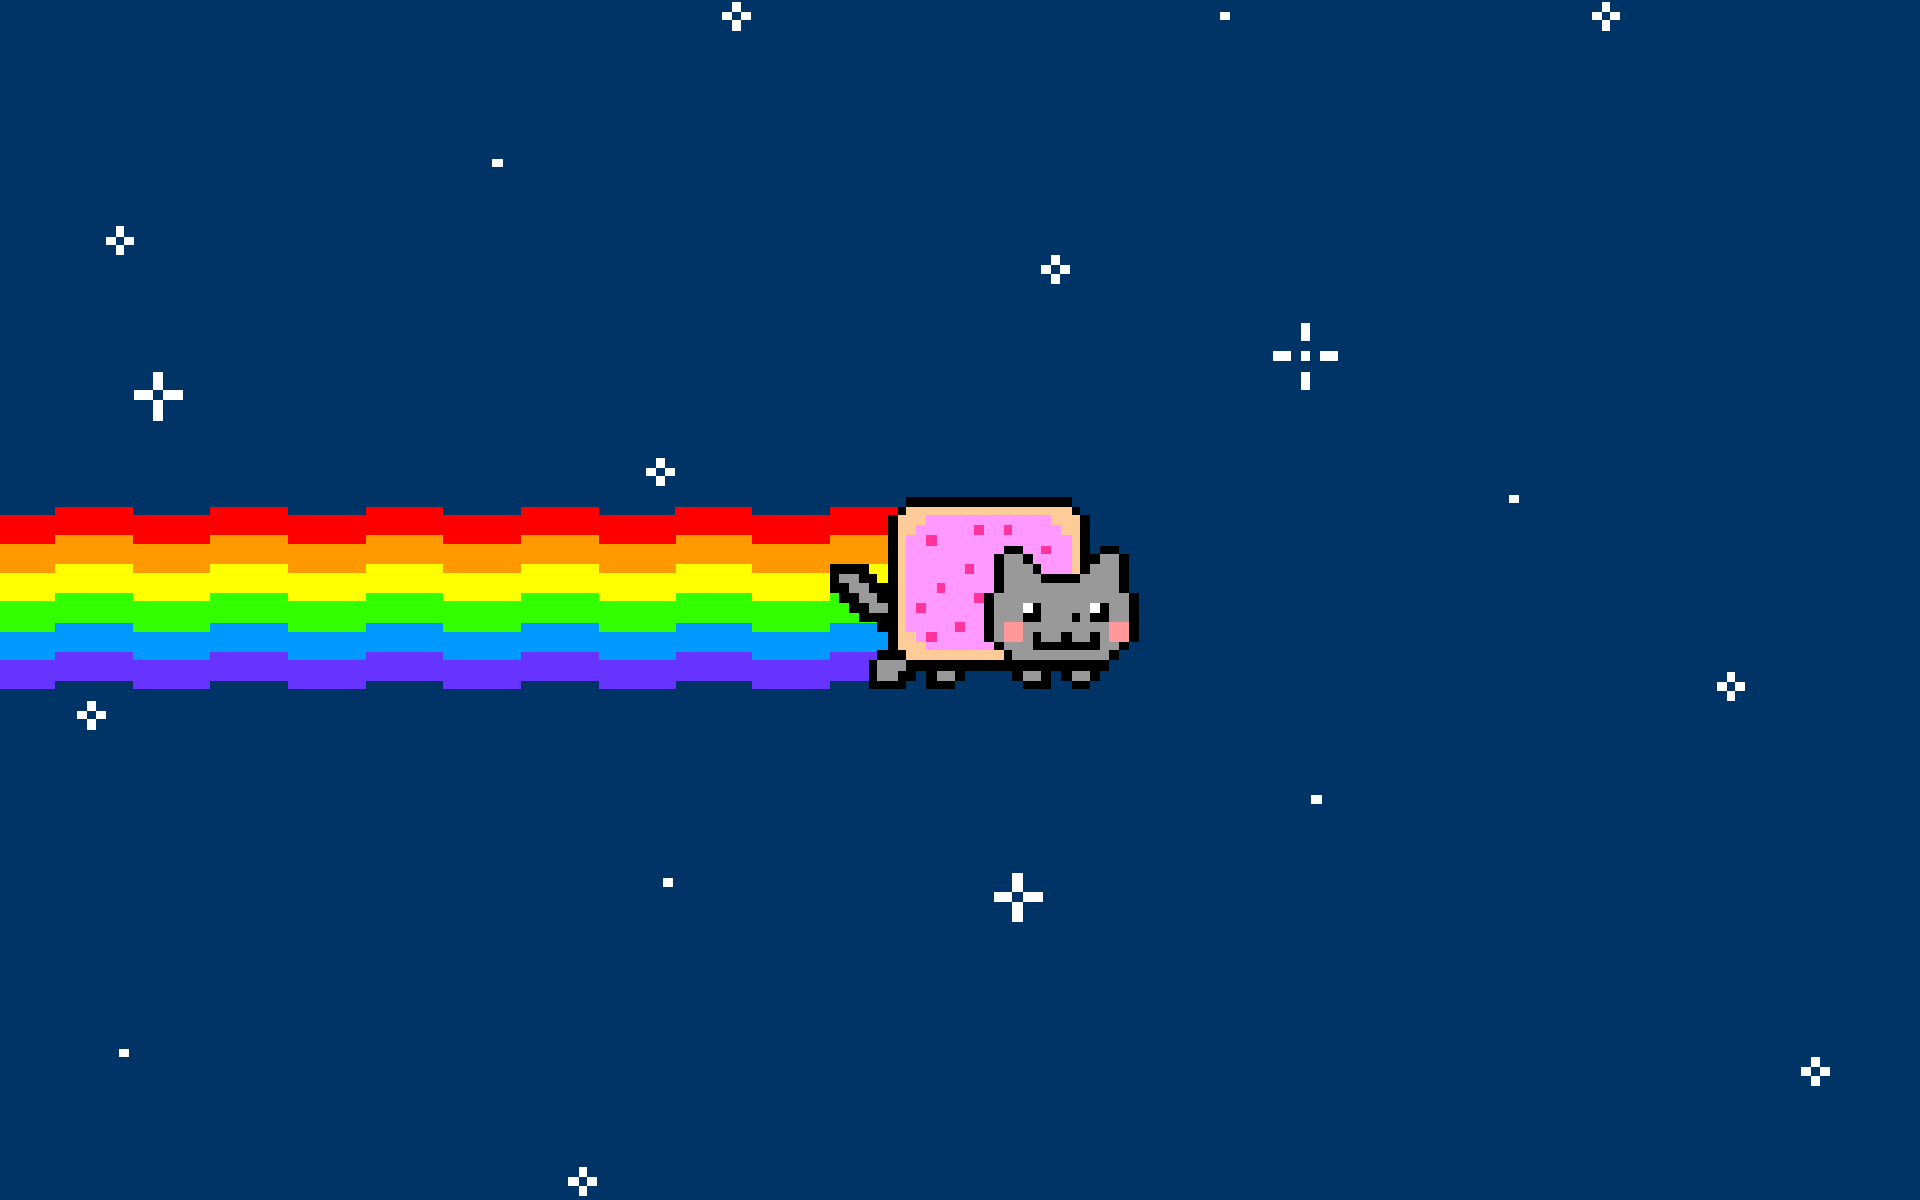 rainbow cat wallpapers - photo #14